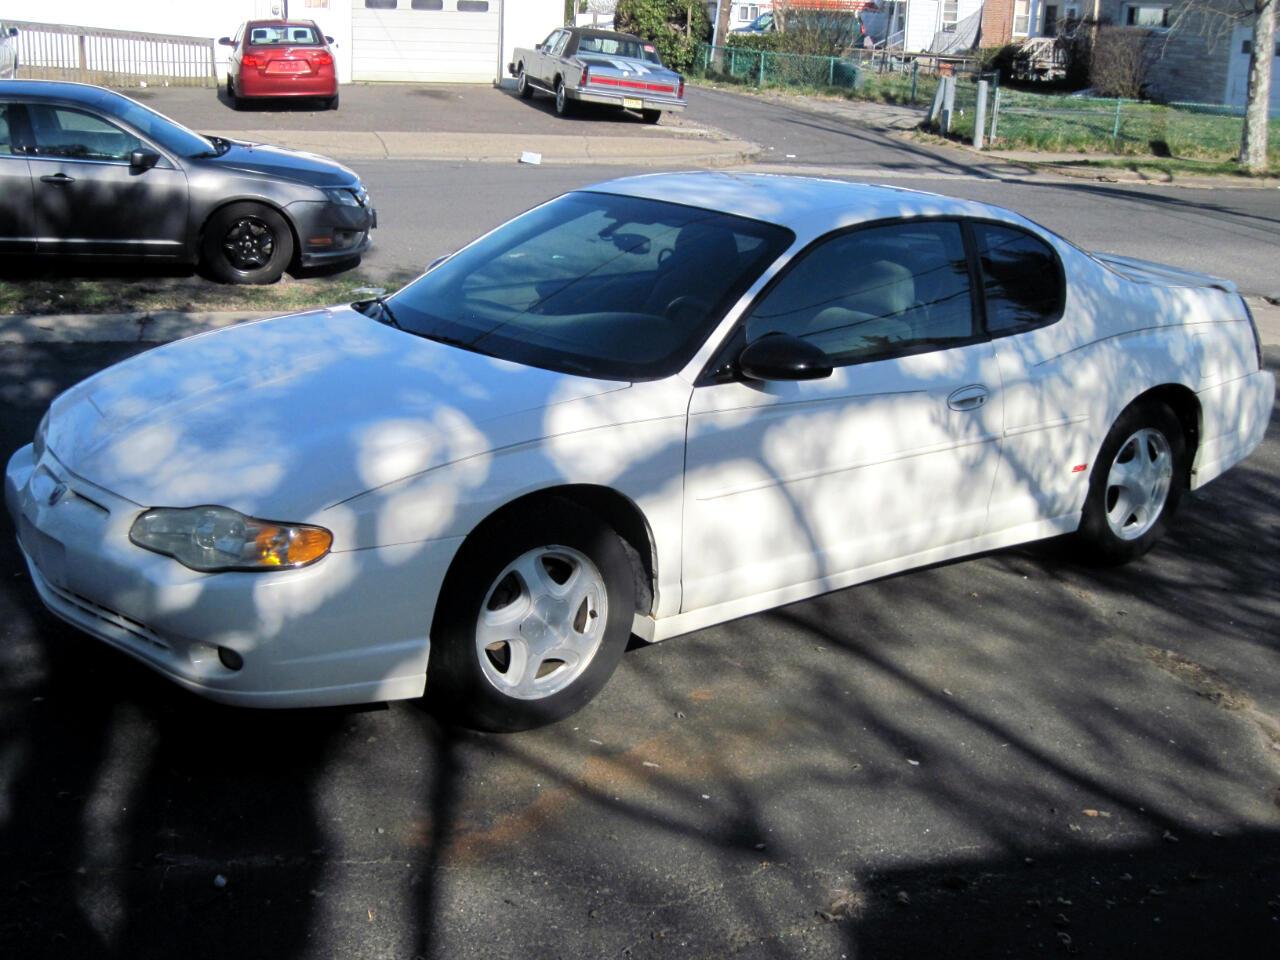 2004 Chevrolet Monte Carlo 2dr Cpe SS